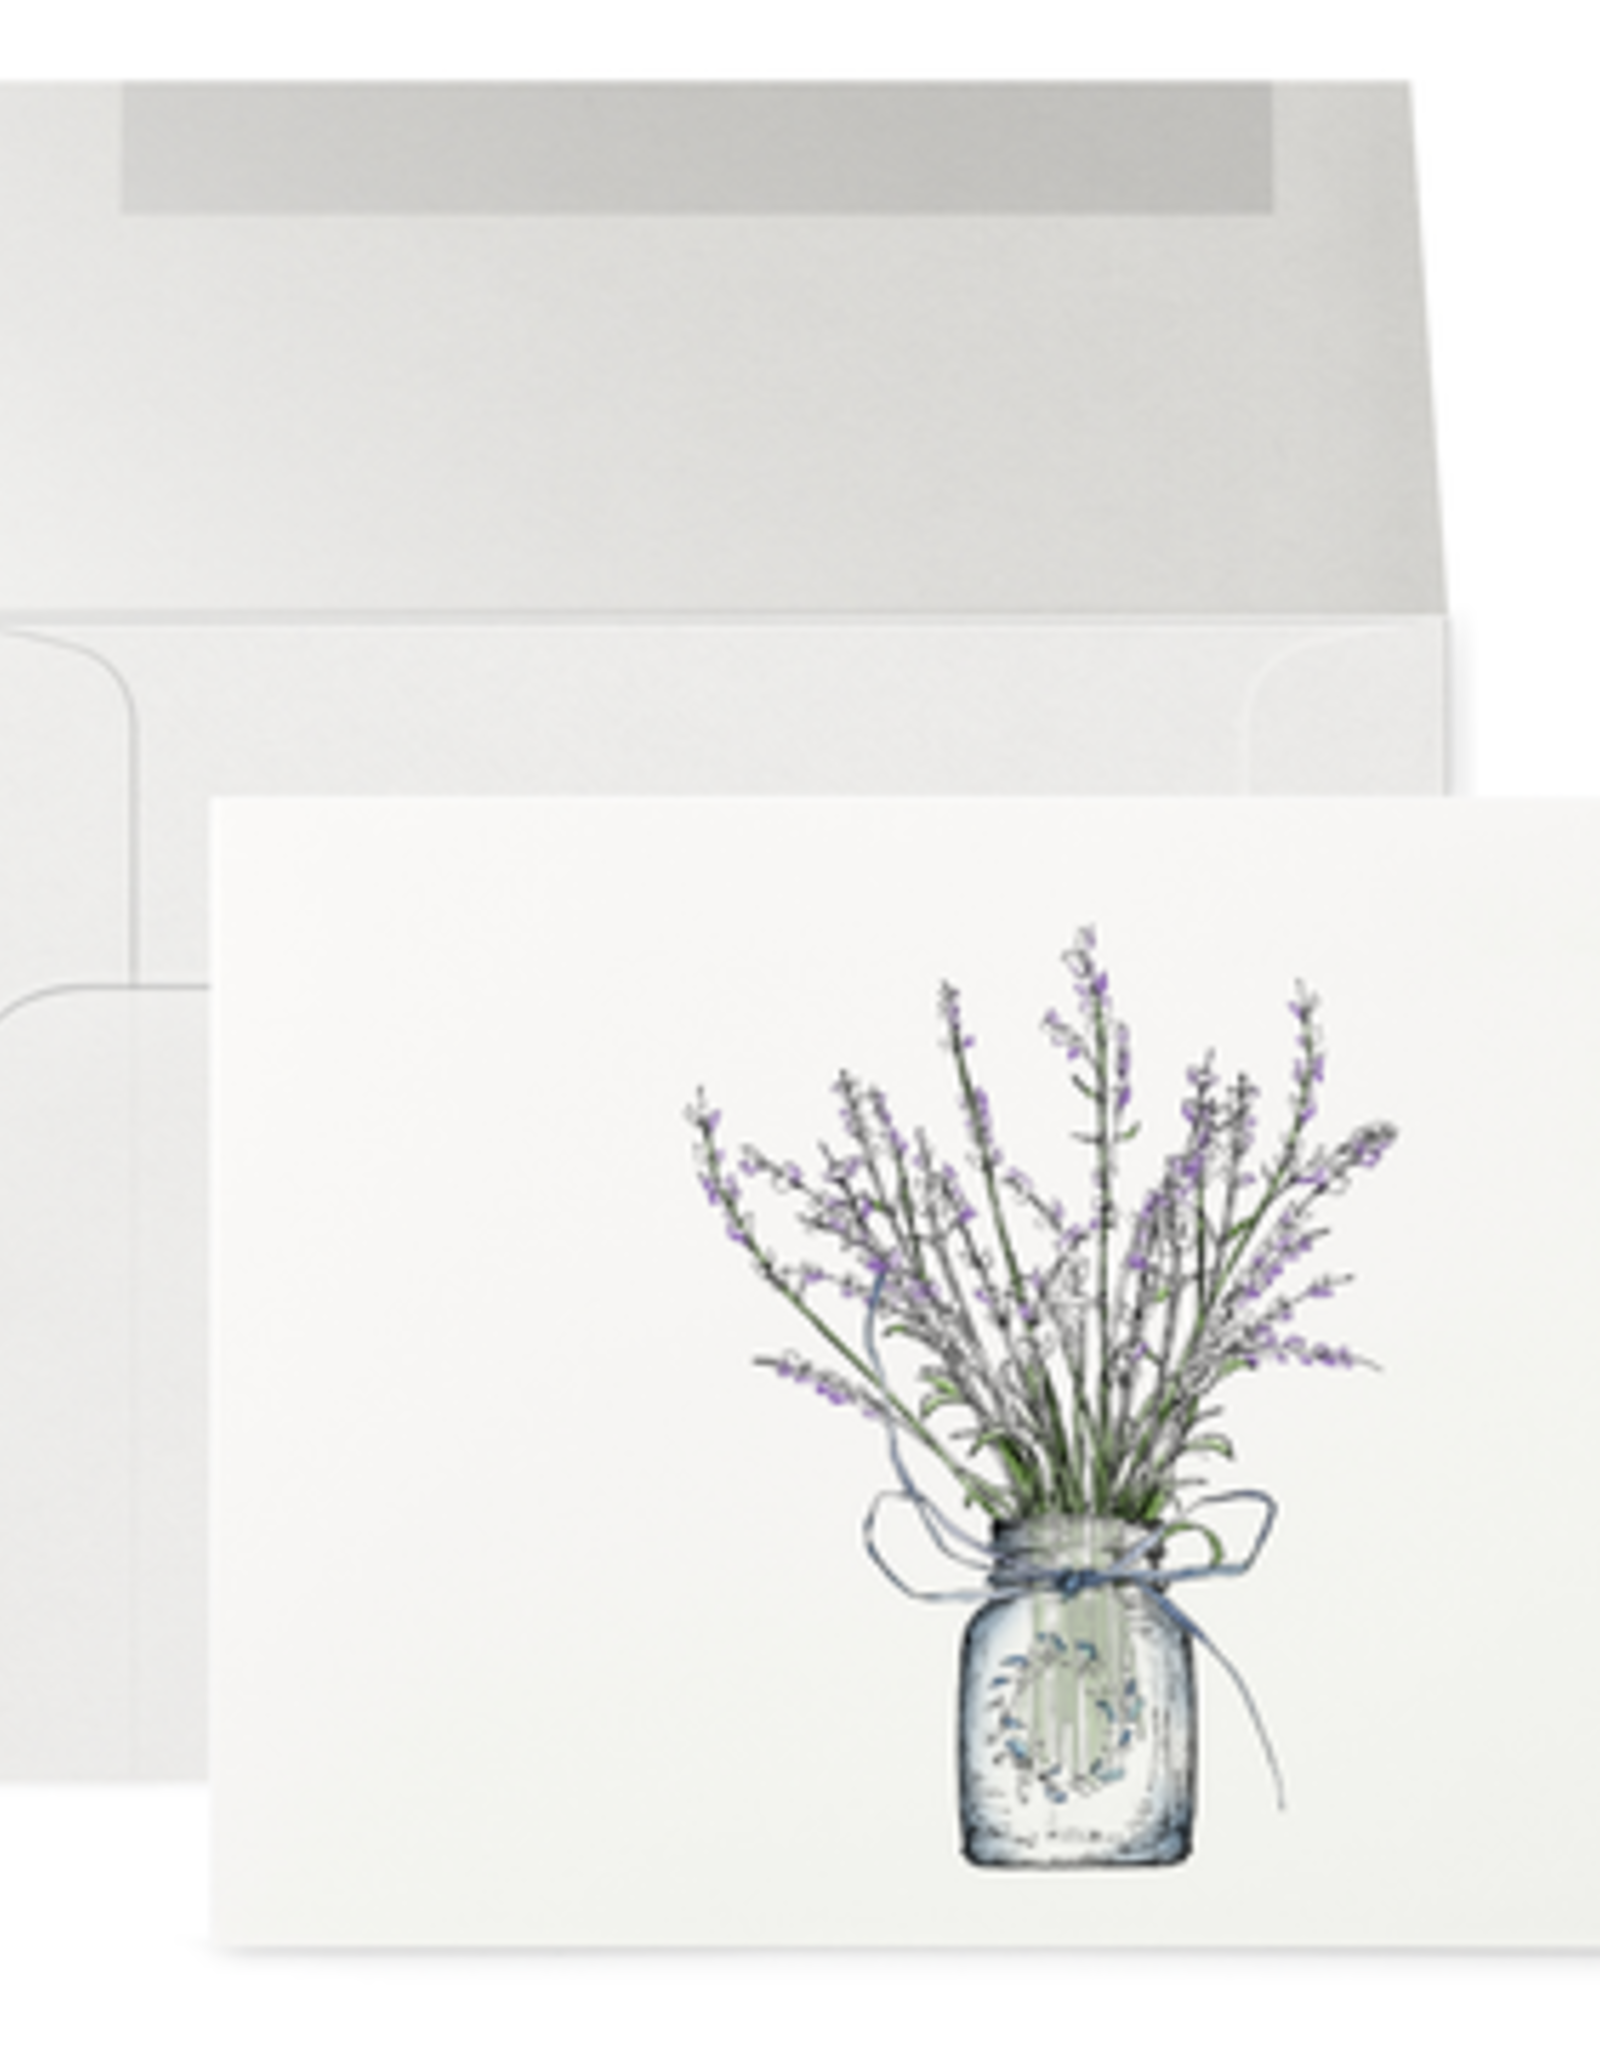 Petits Mots Petits Mots Card, Lavender Jar